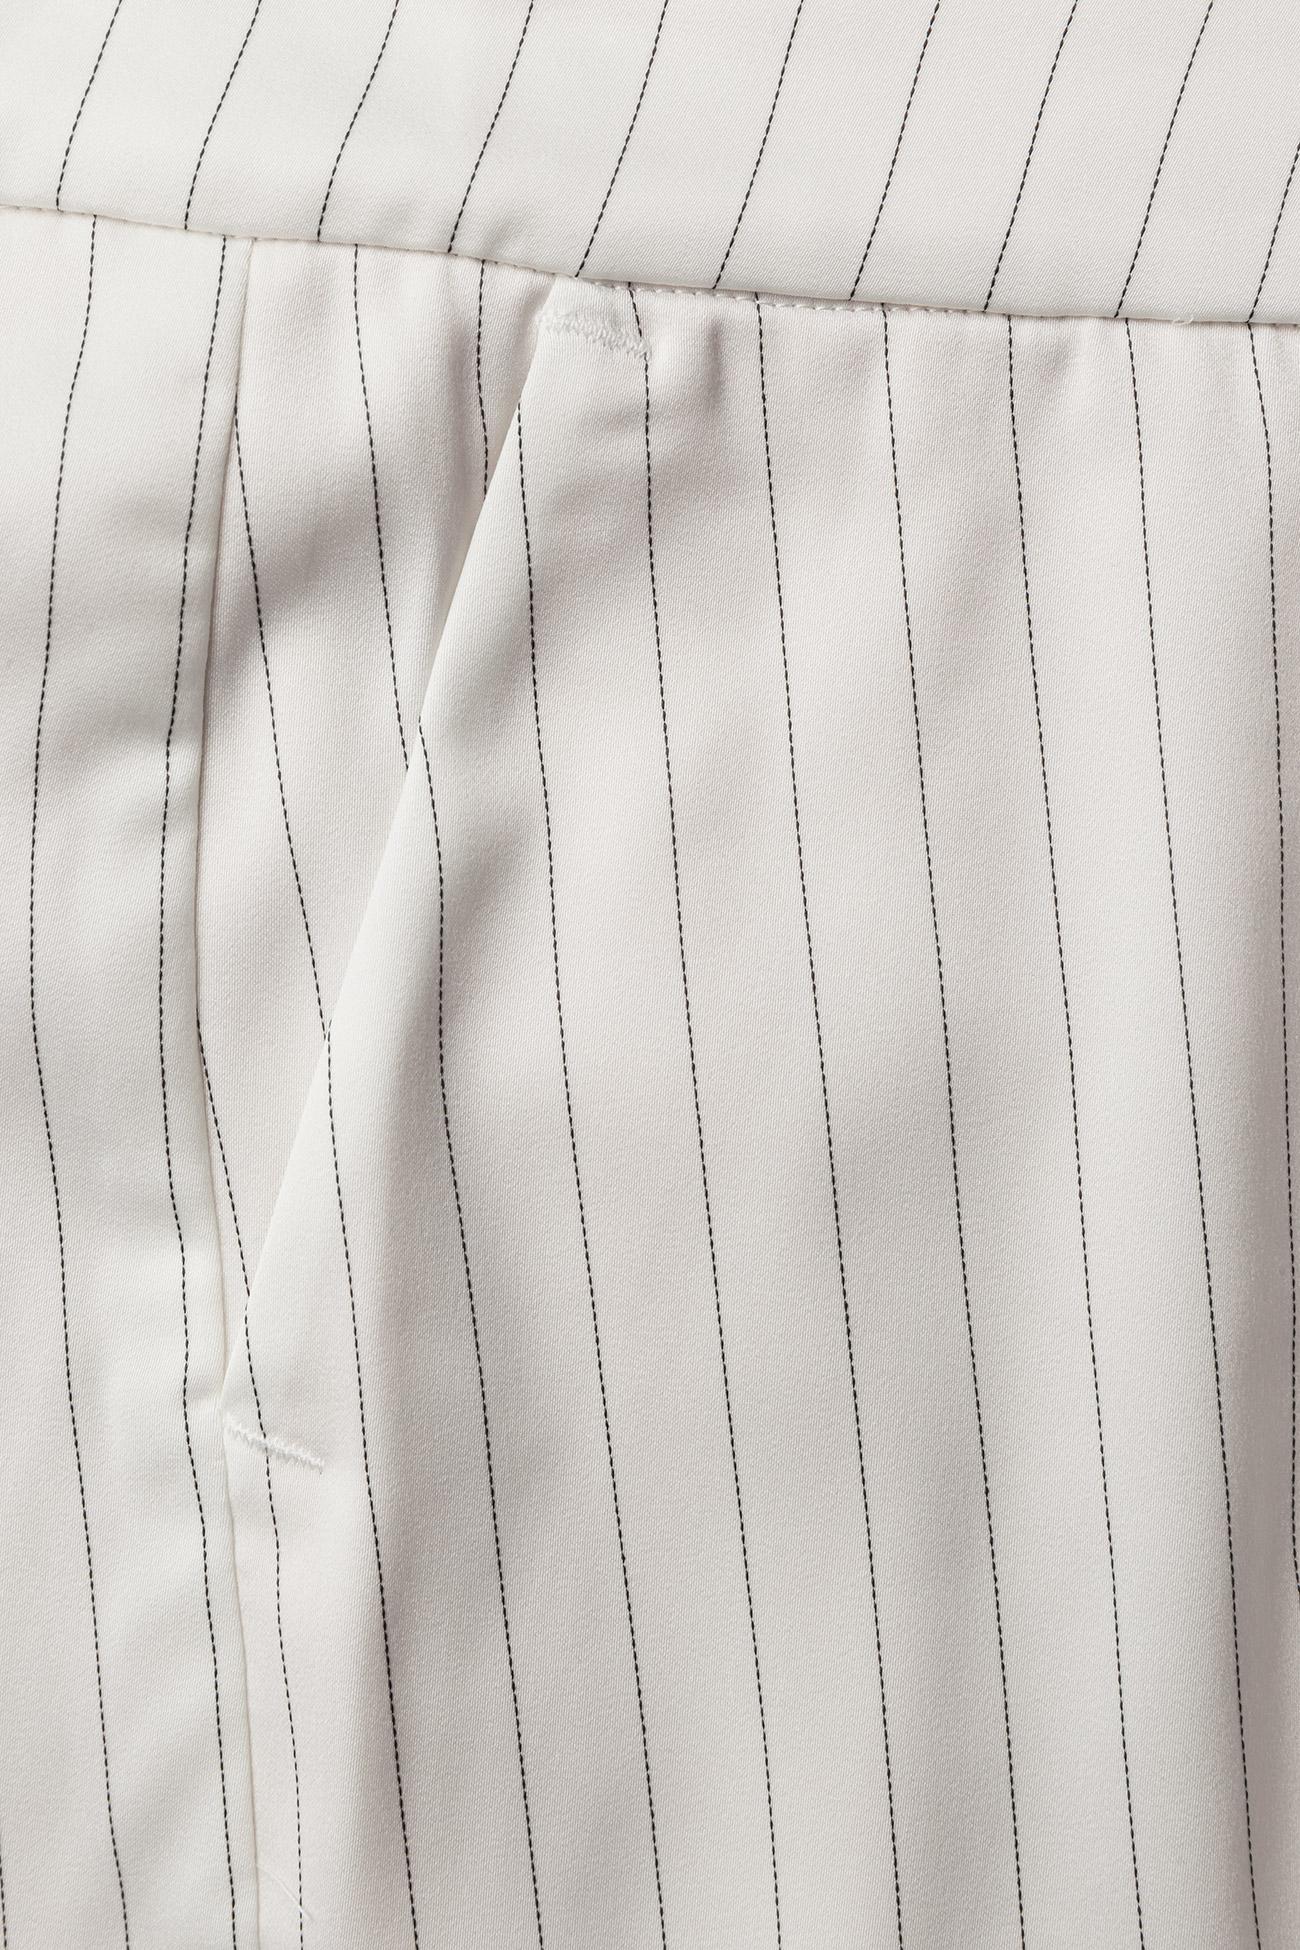 2nd One Eloise 807 Crop, Cream Pin, Pants - Byxor Pin